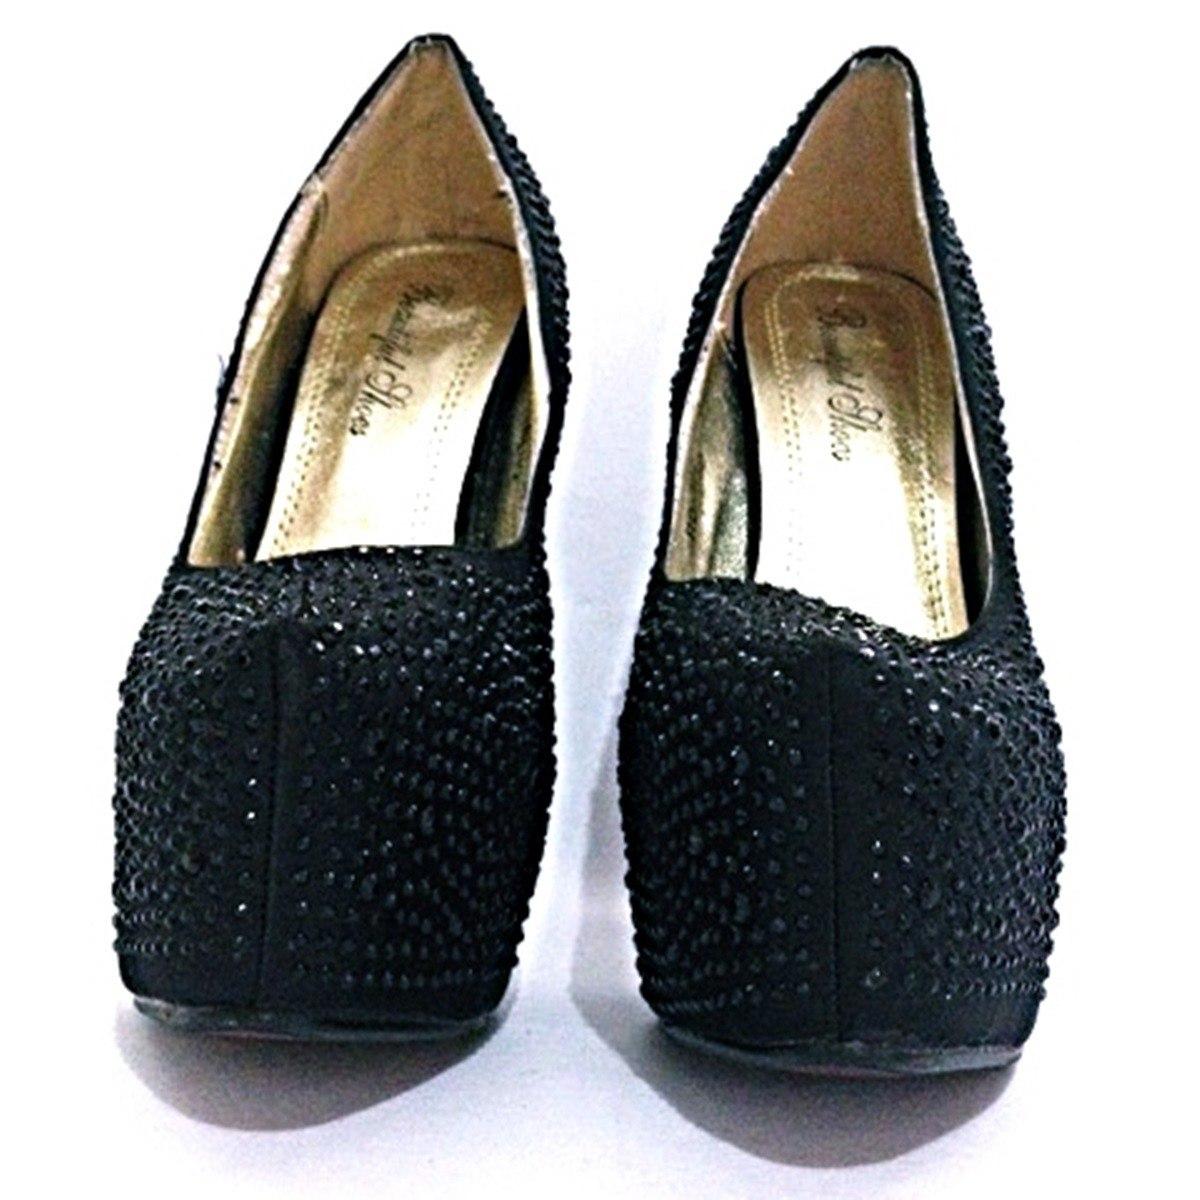 992df14ea sapato feminino preto strass festa luxo salto alto -010. Carregando zoom.